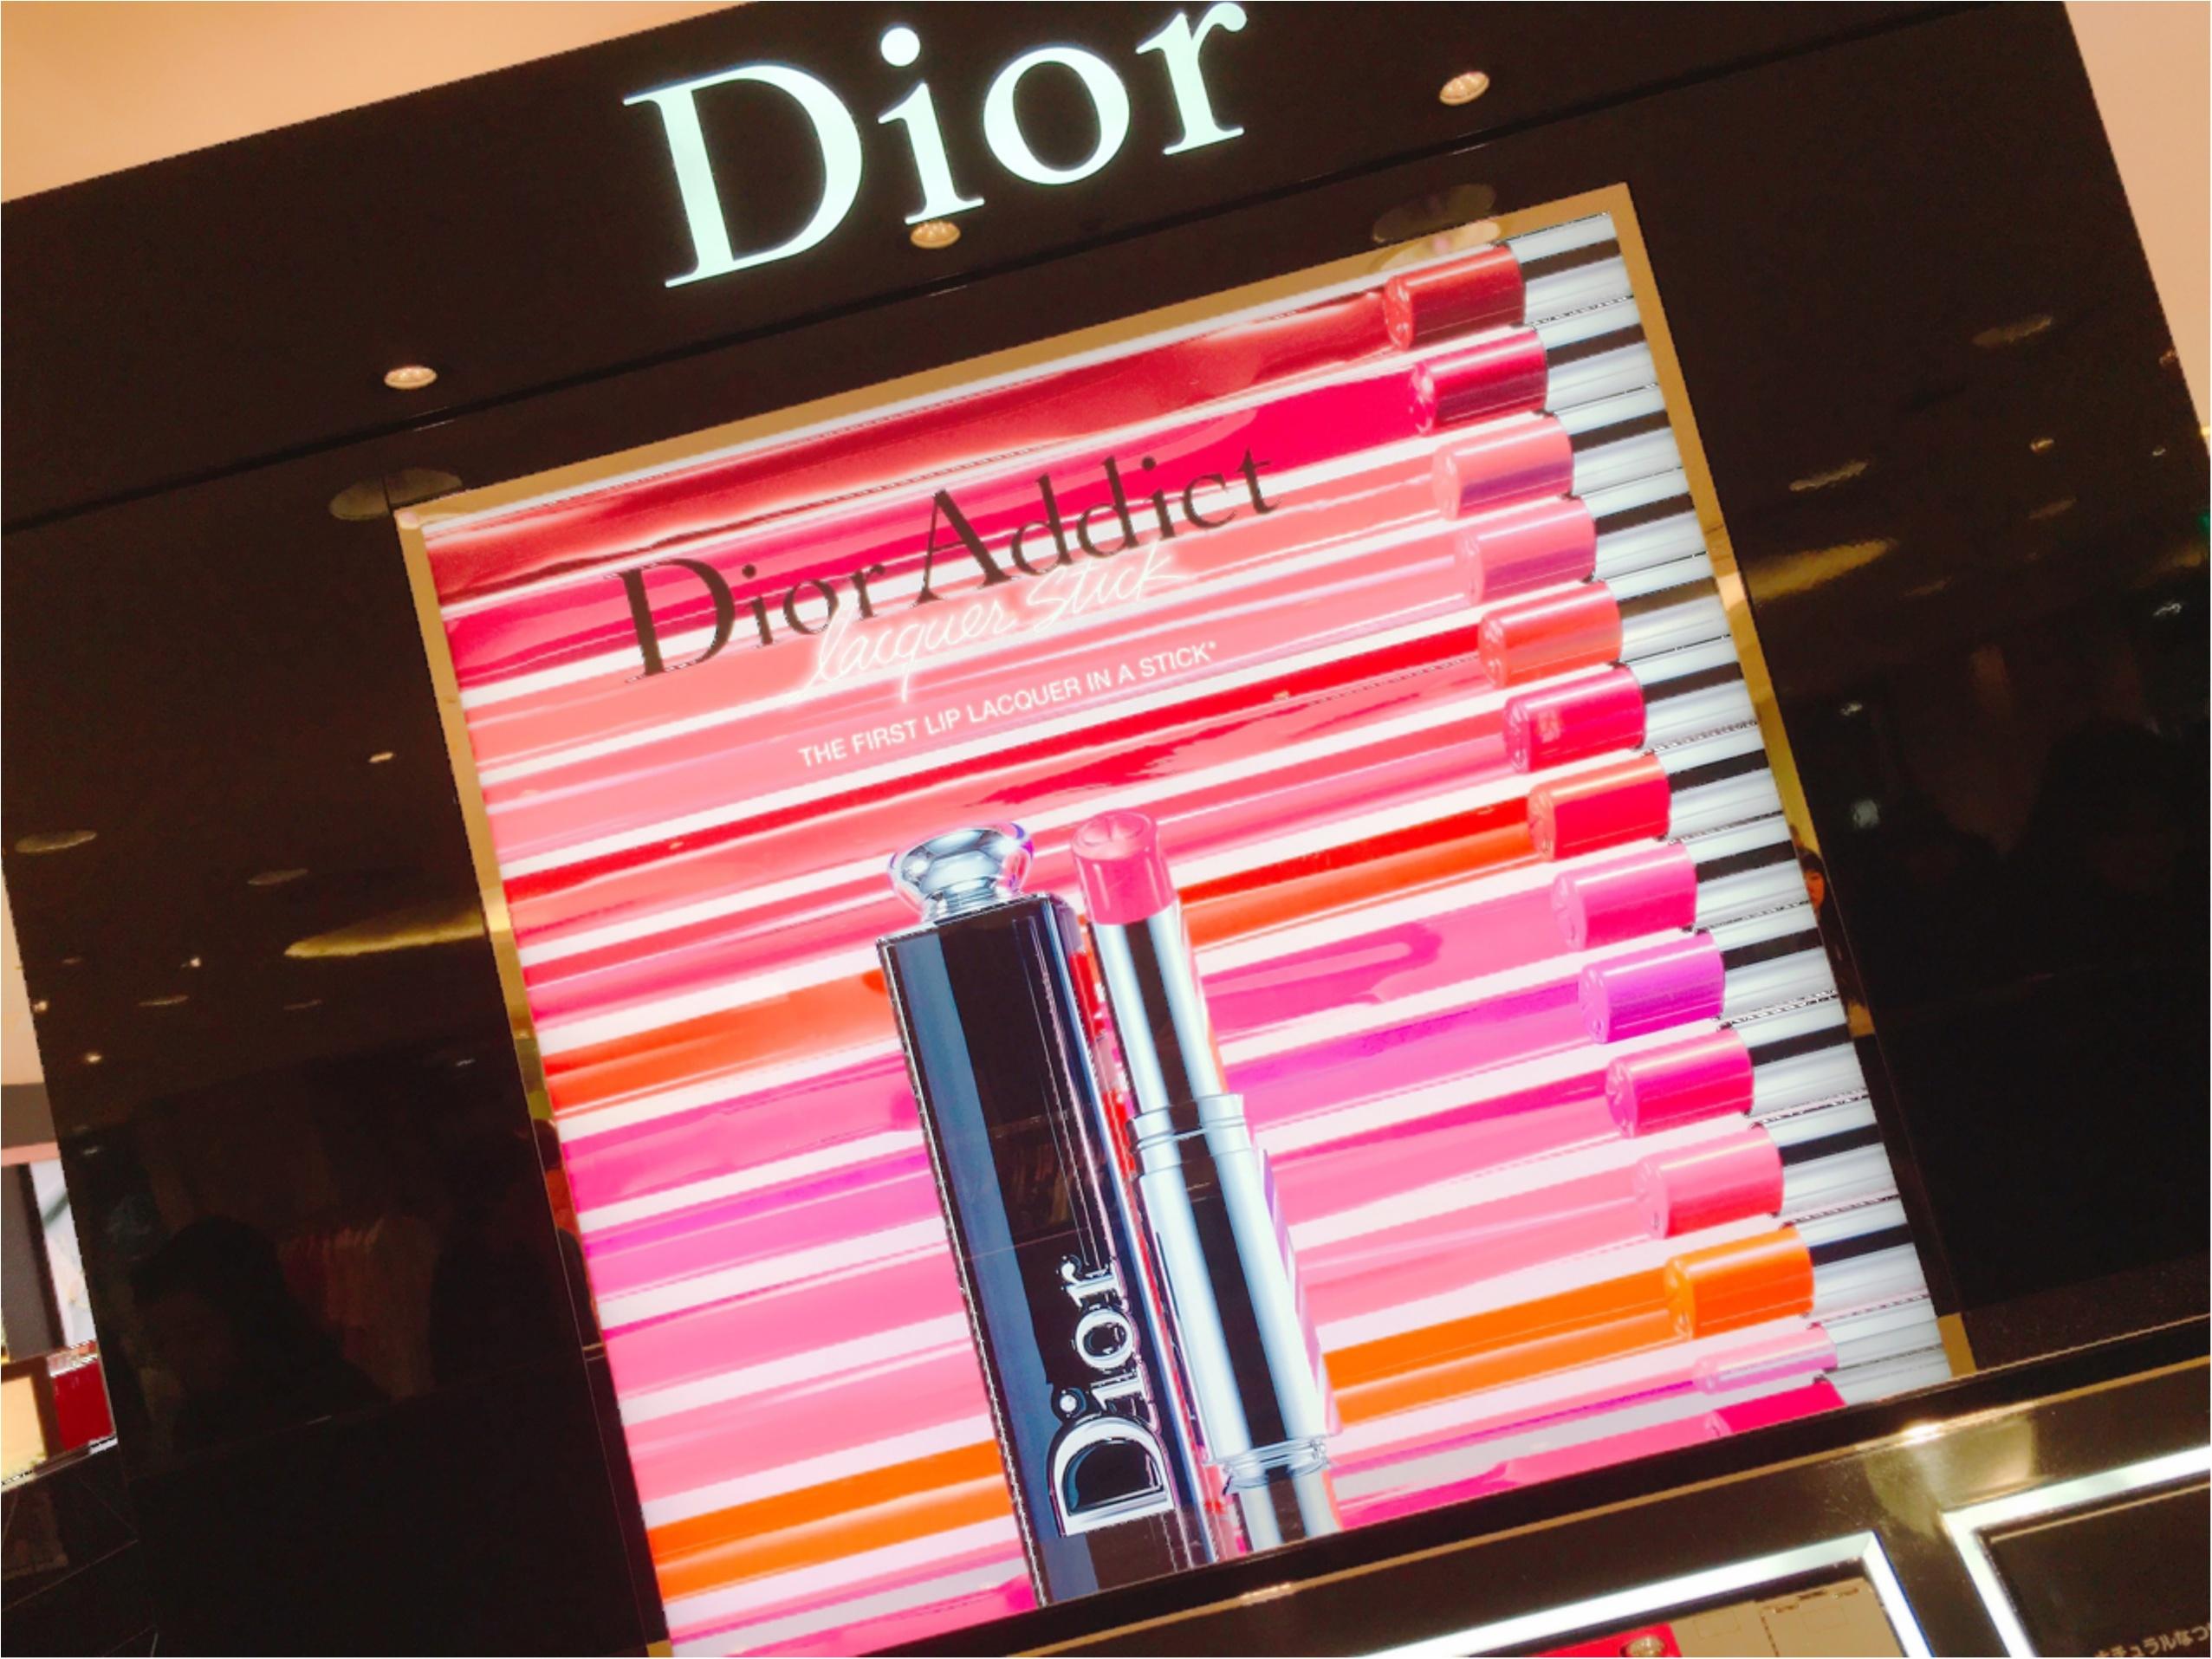 Dior アディクトラッカースティック♡♡♡新感覚のフォンダンリップ!?発色の良さと塗り心地が最高♡☺︎_1